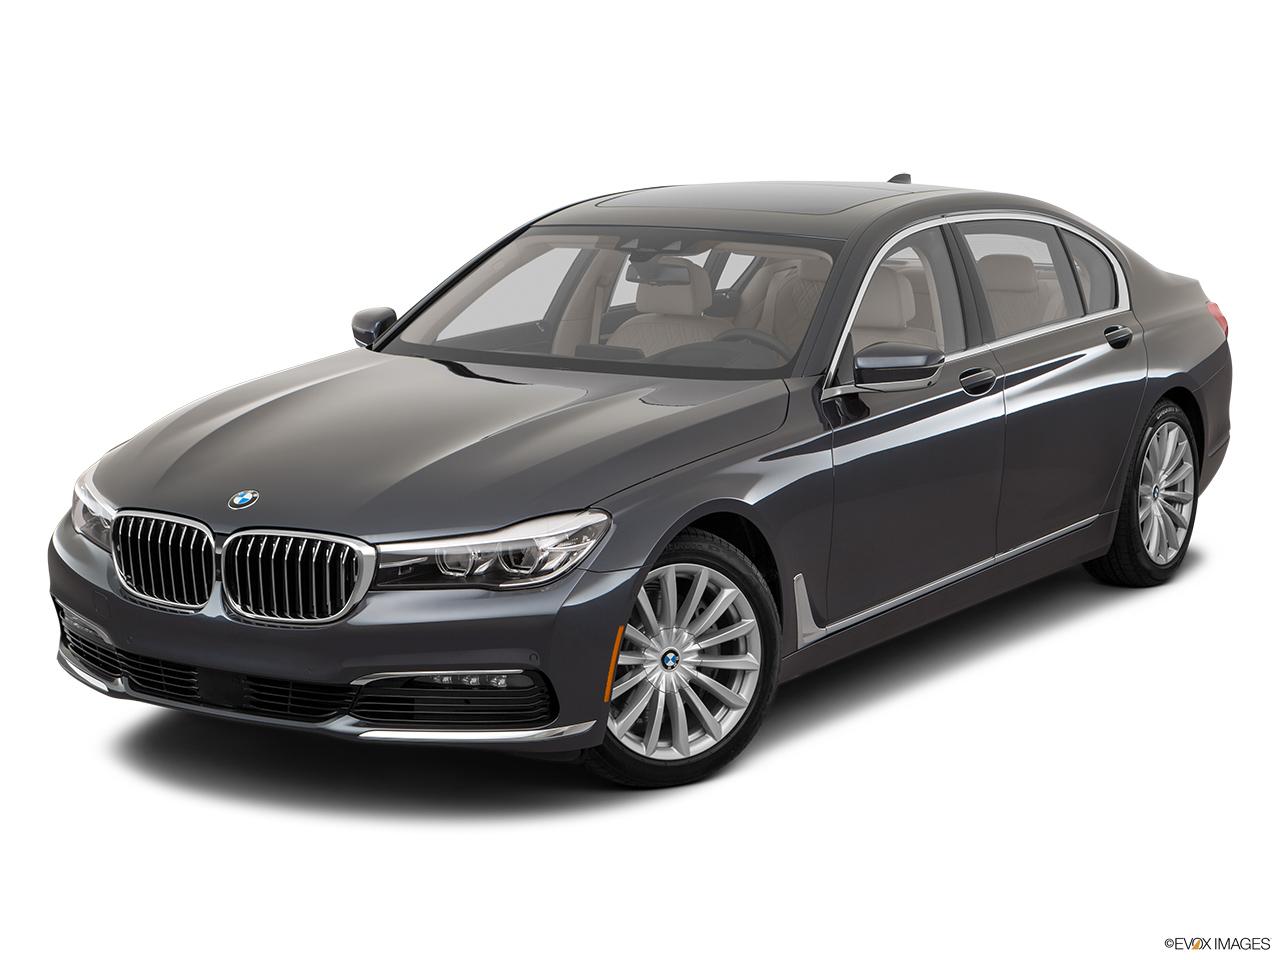 BMW 7 Series 2017 750Li United Arab Emirates Front Angle View